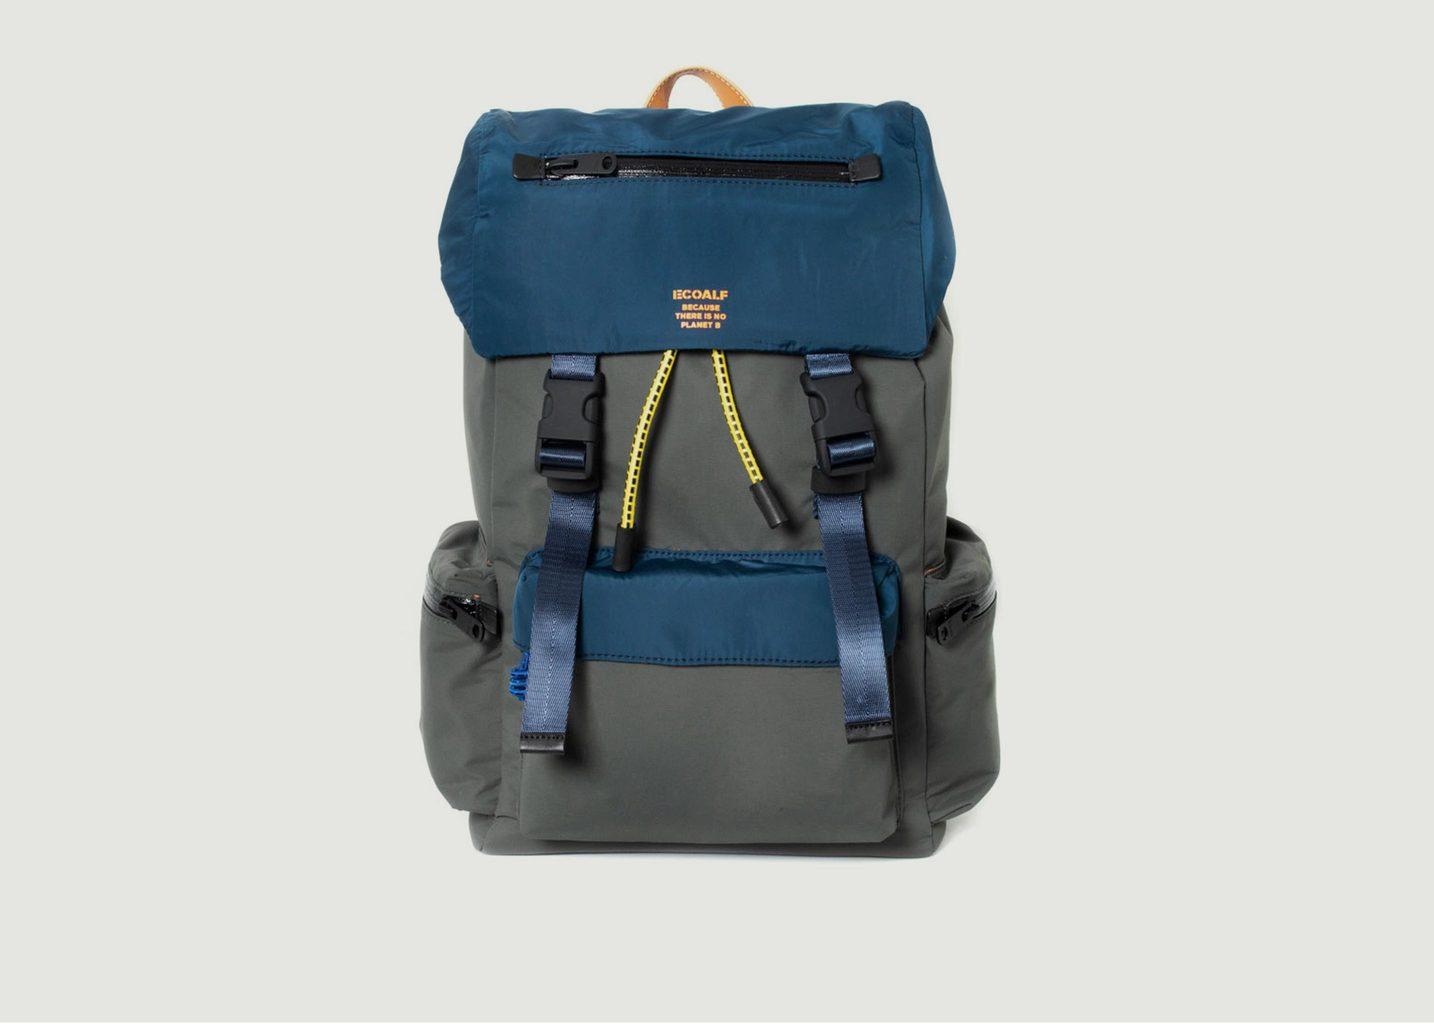 Sac à dos Wild Sherpa en nylon recyclé - Ecoalf